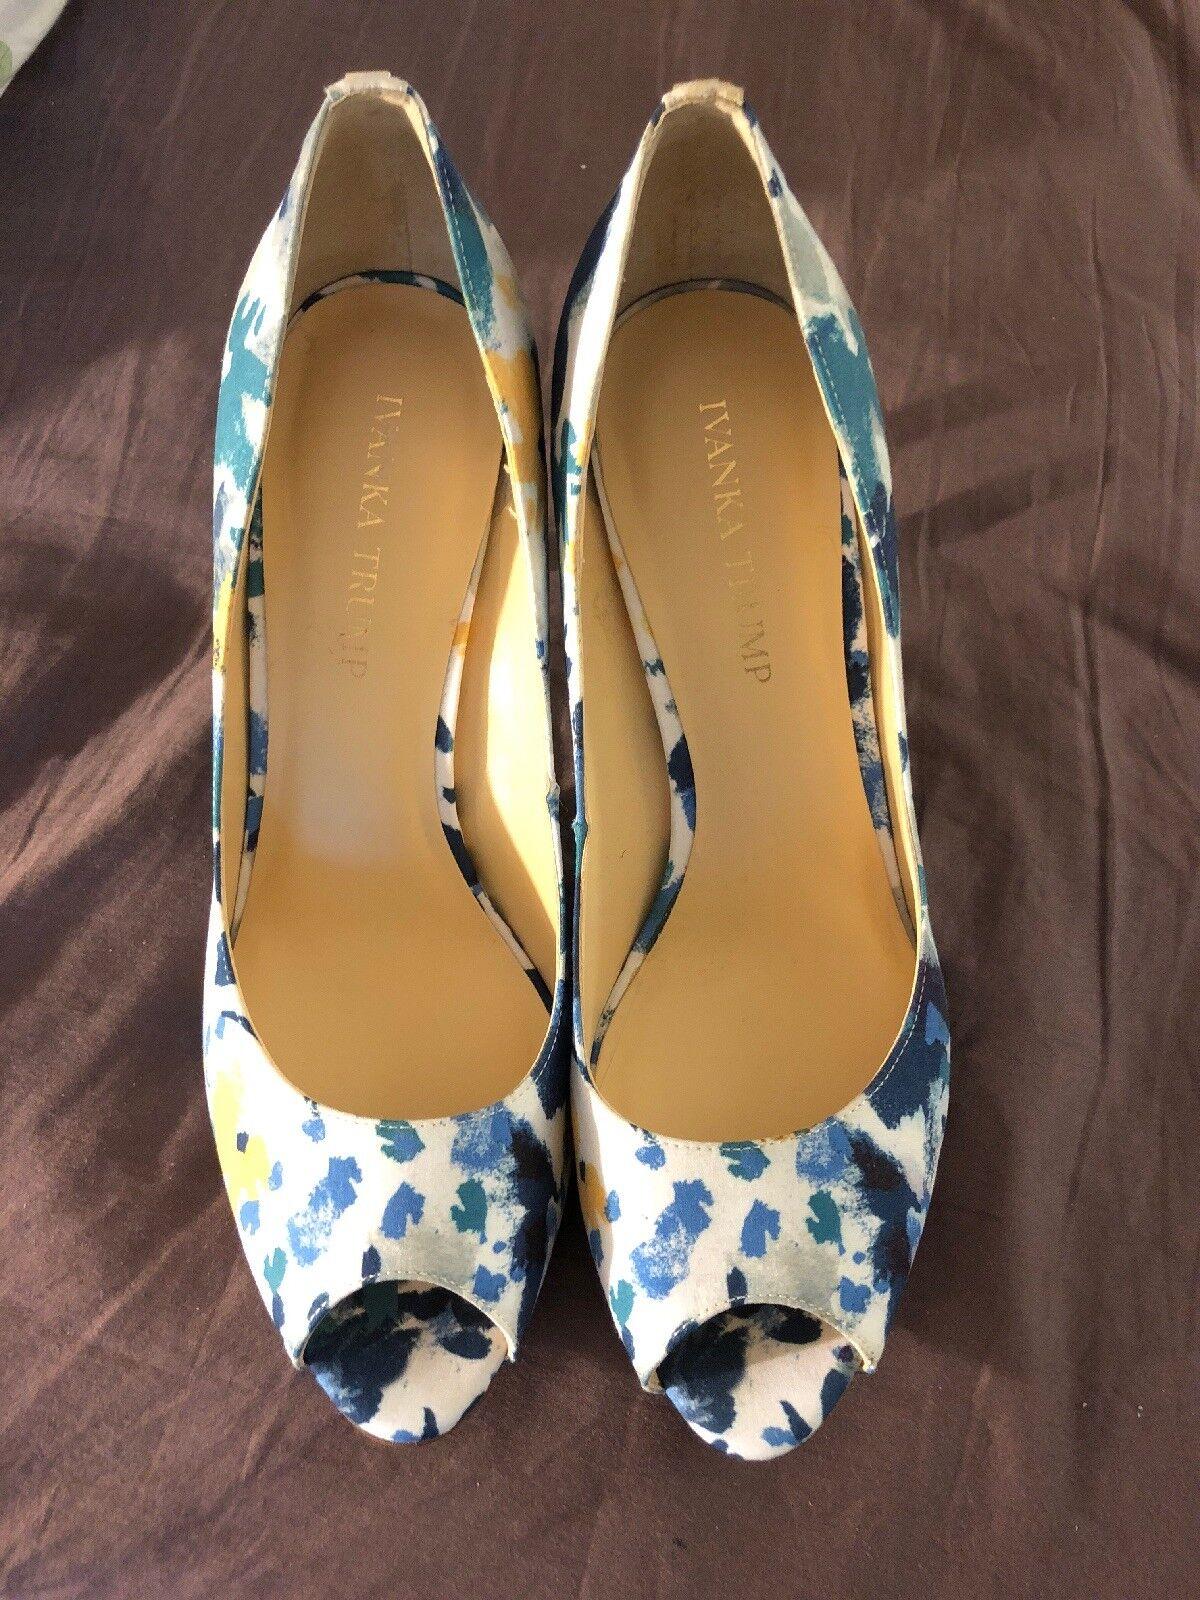 NEU Ivanka Trump Peep Toe Floral Blau Yellow Multi Cleo Pump Heels Gre 8.5 :)